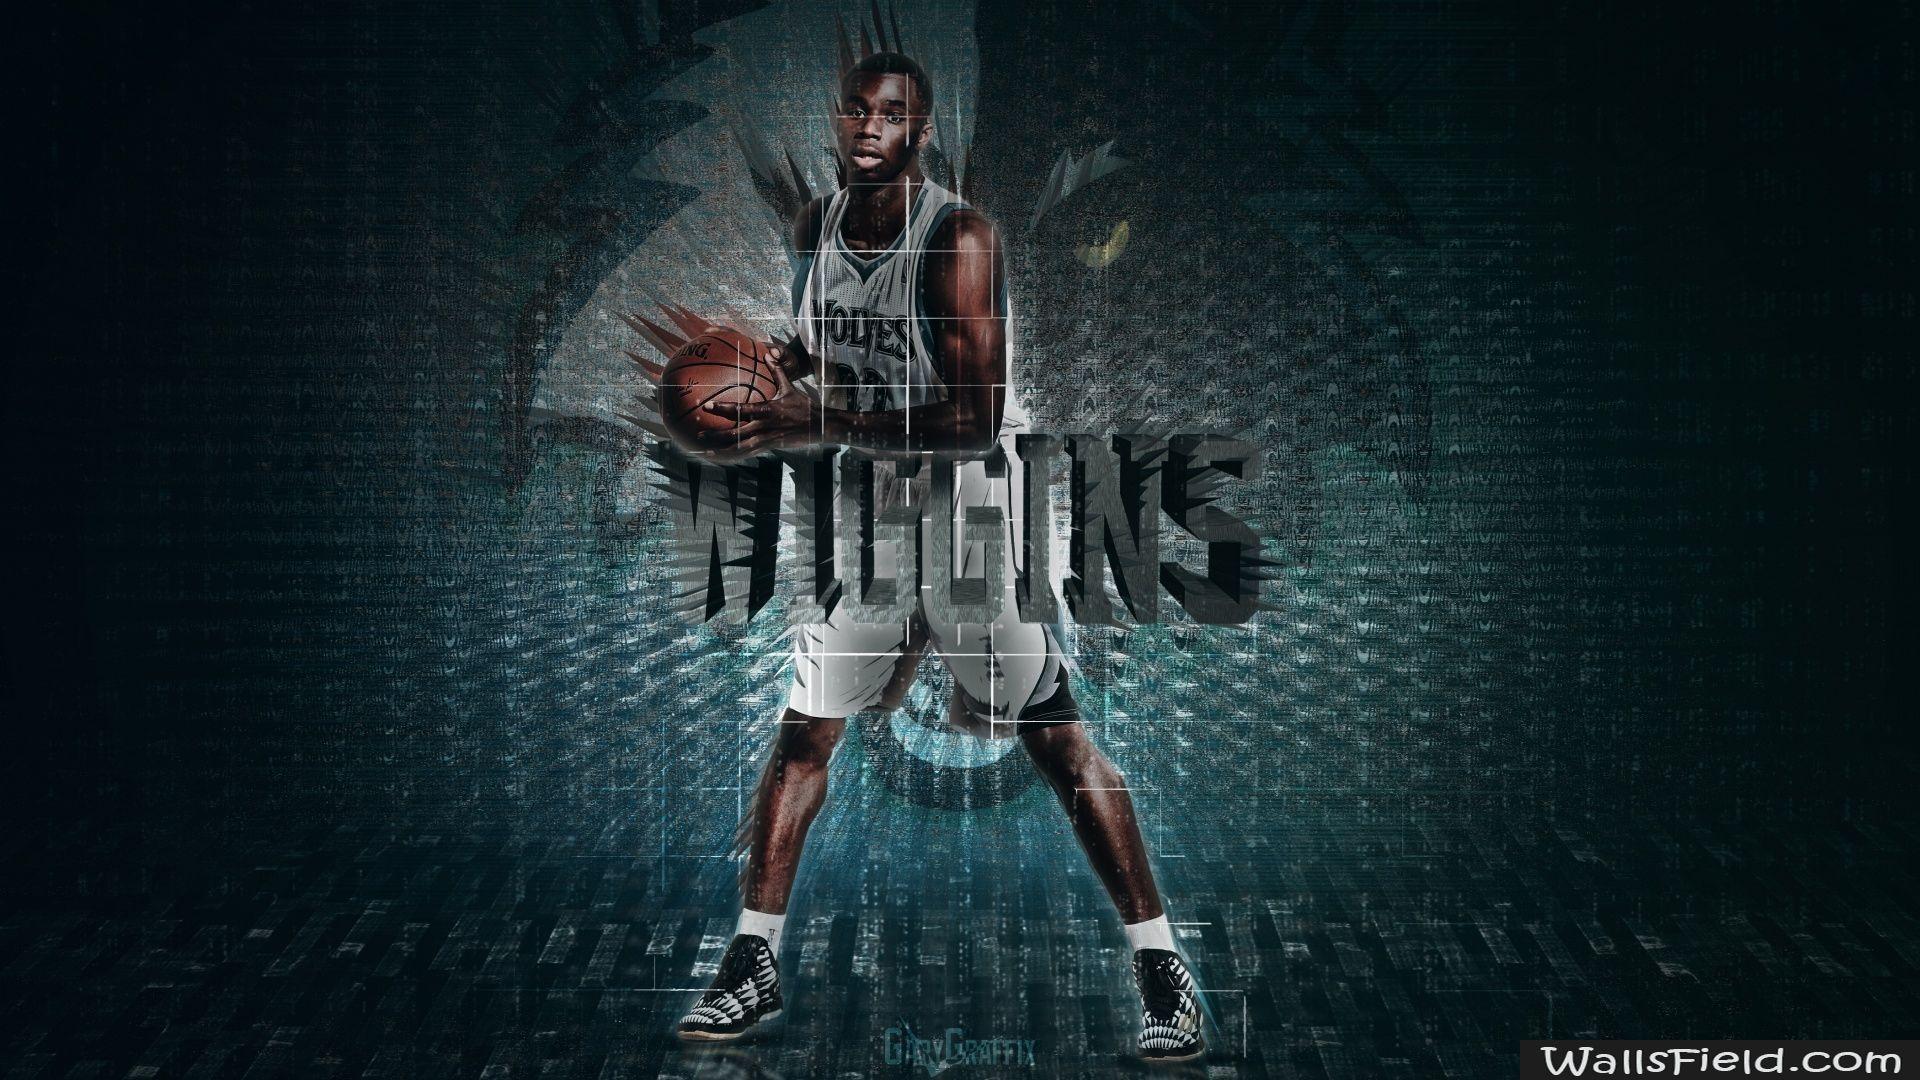 Minnesota Timberwolves 1080p background